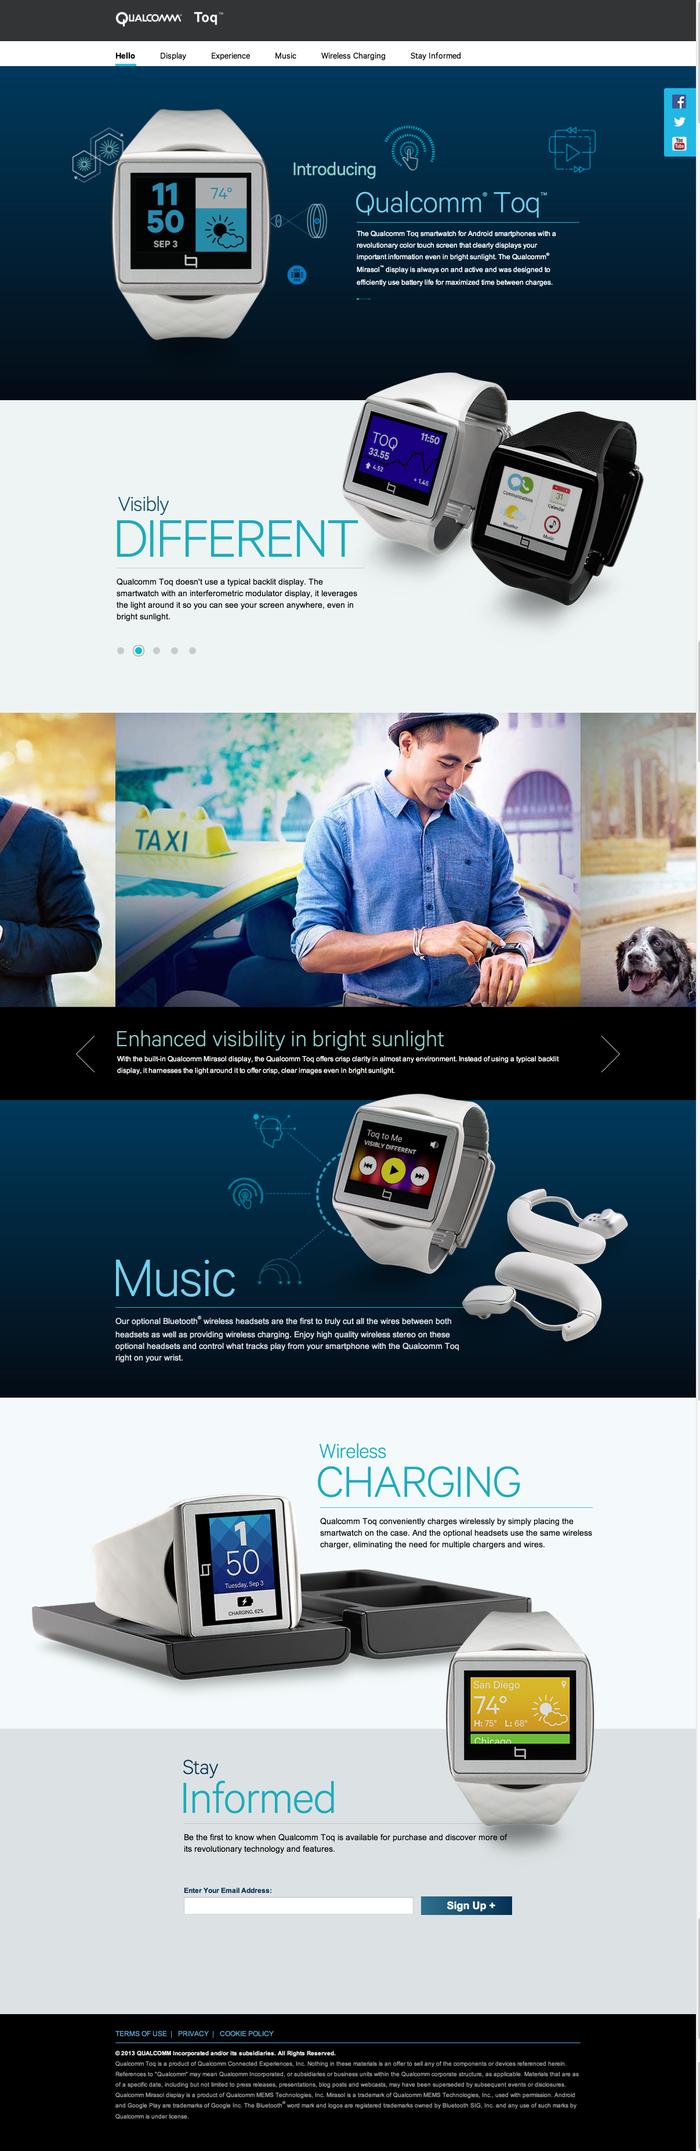 Qualcomm Toq Smartwatch 1